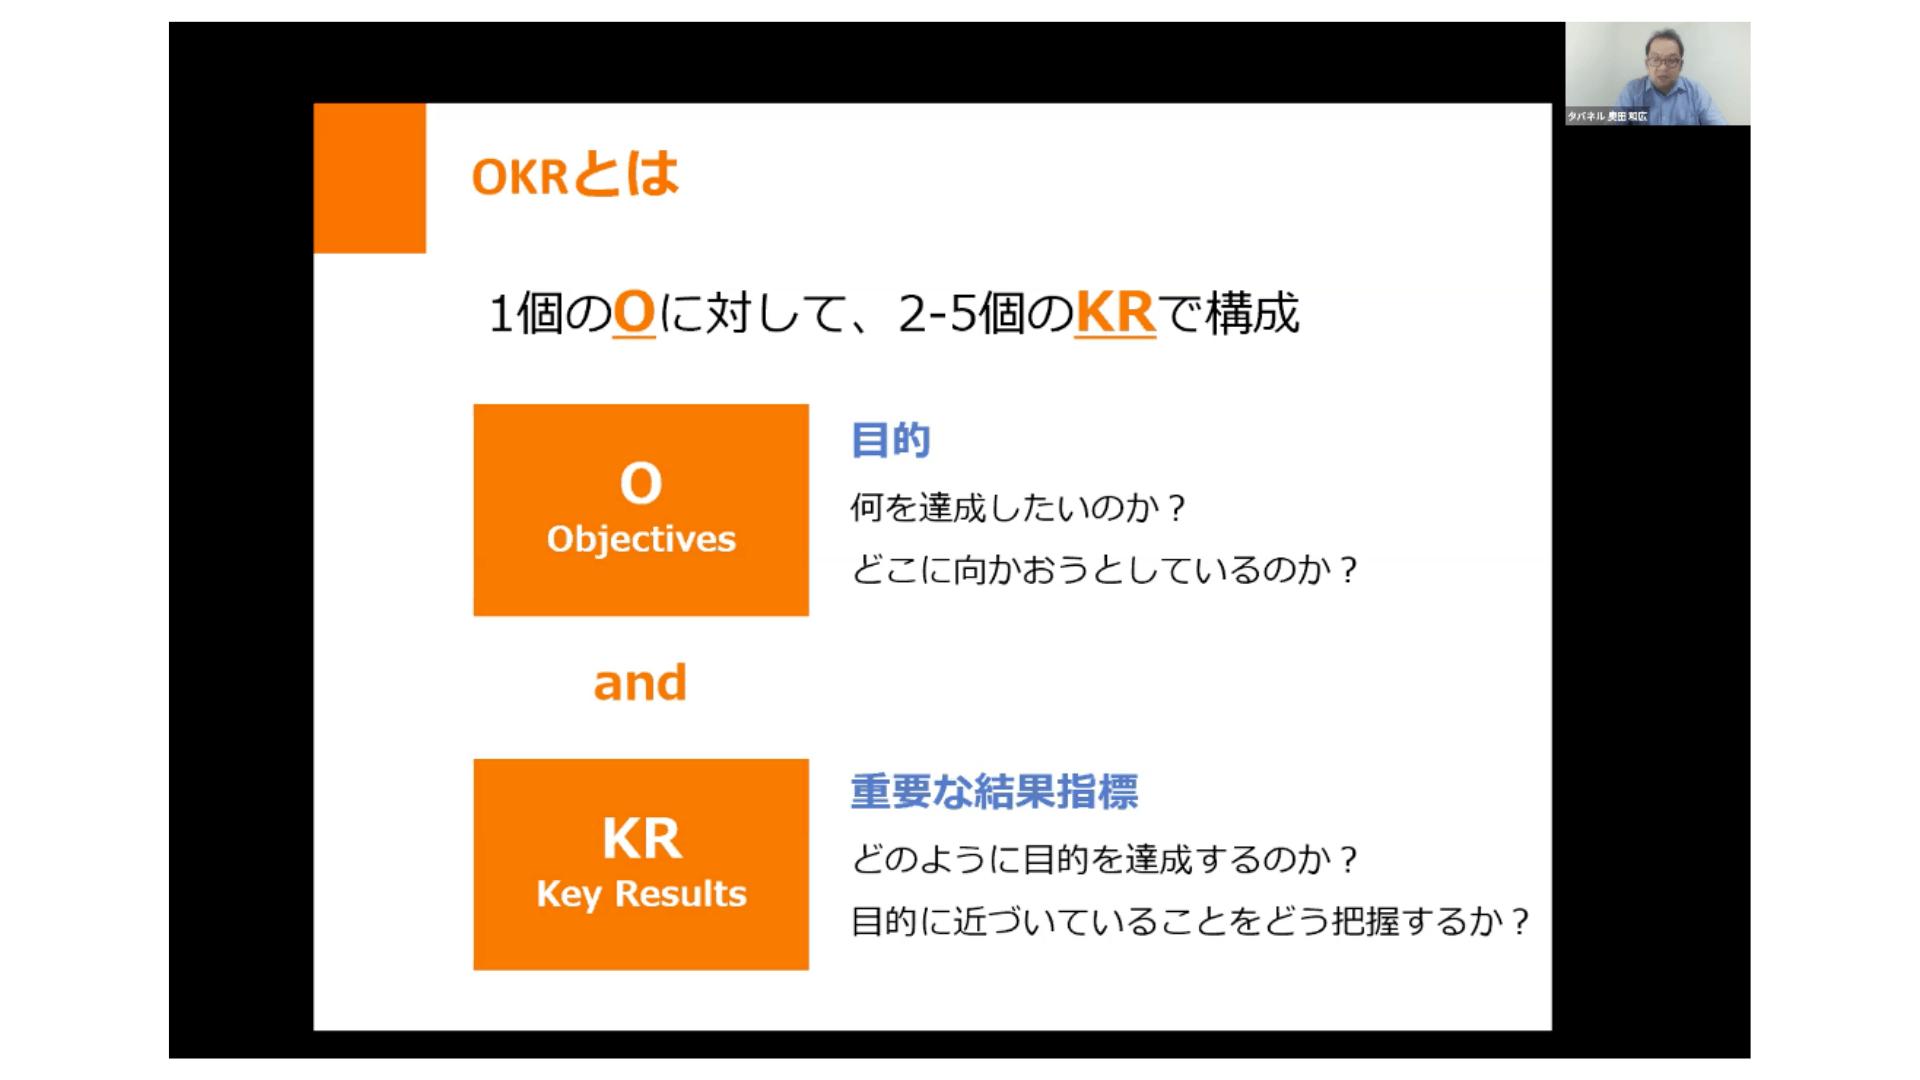 OKR 組織 セミナー 歯科 組織